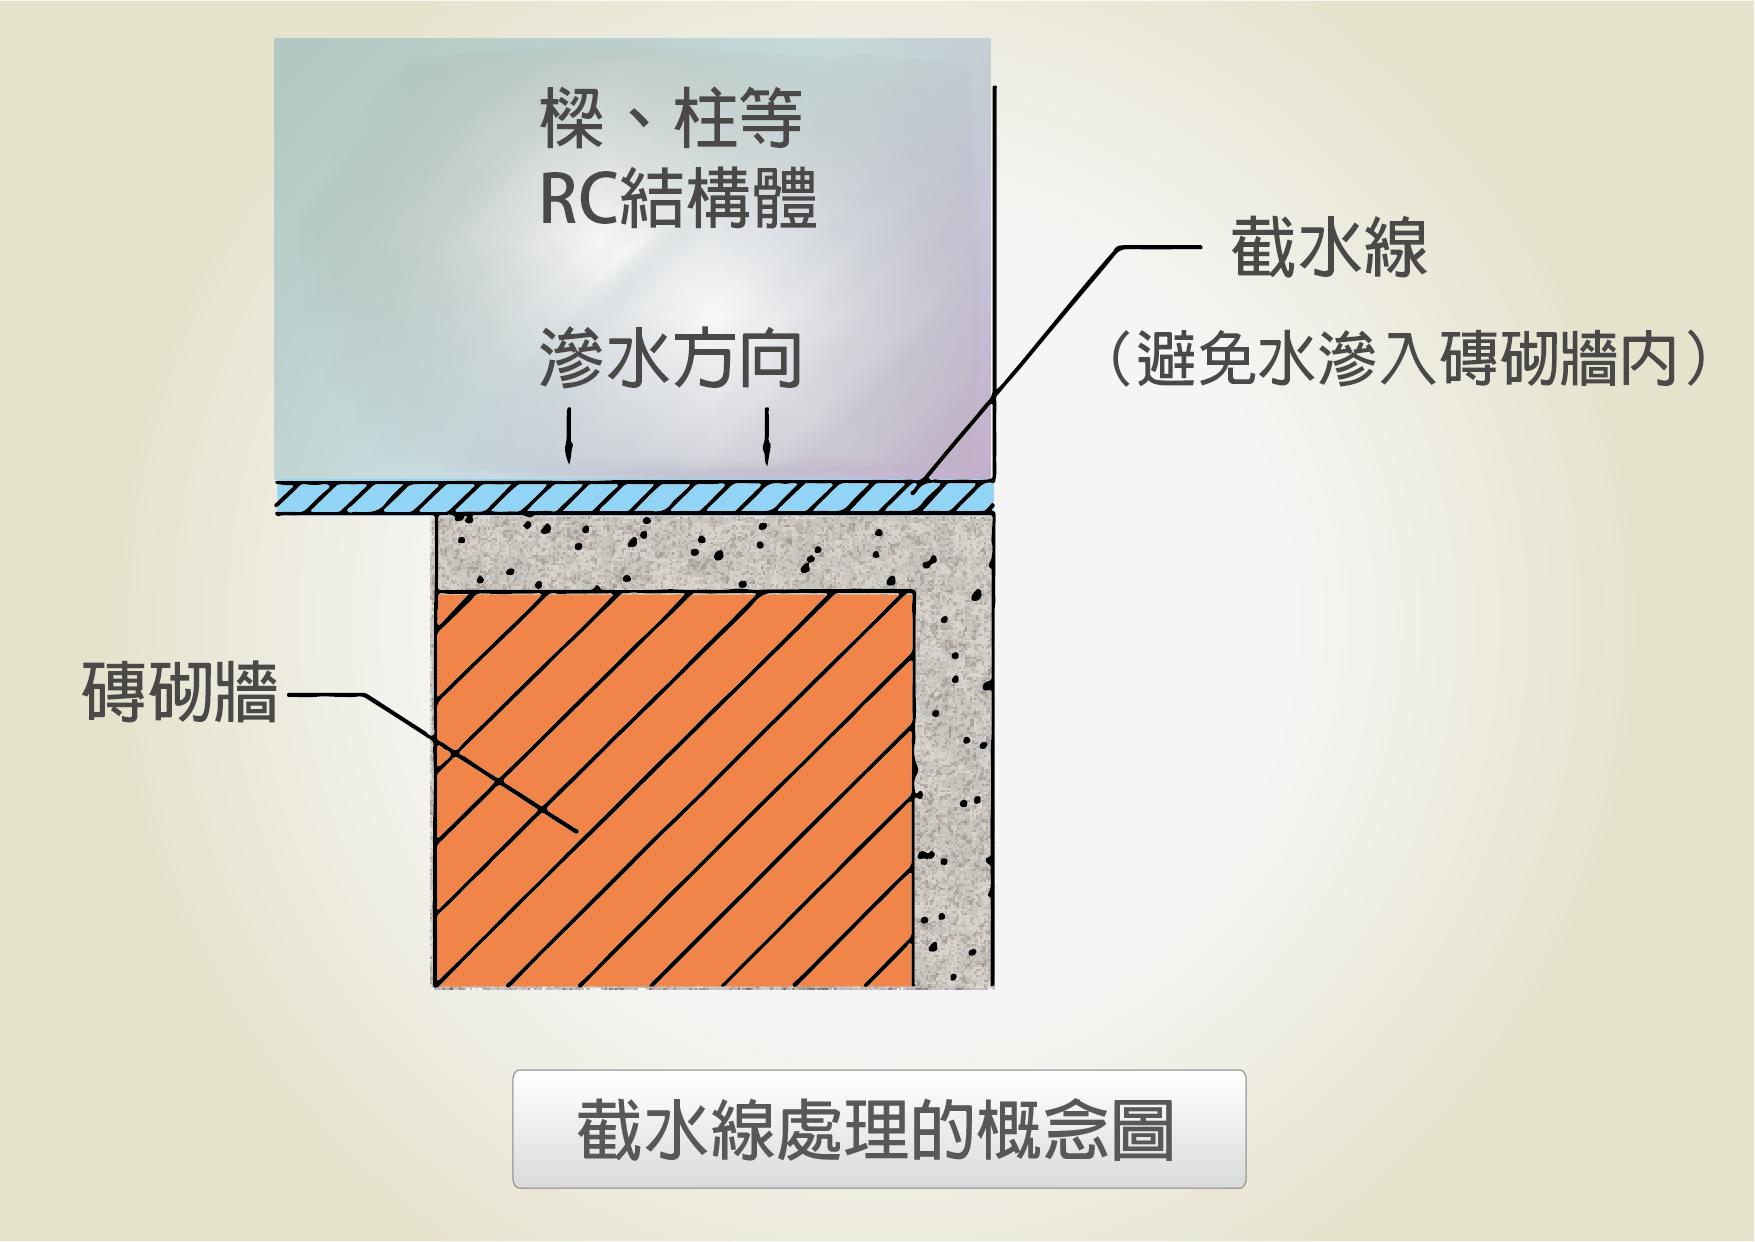 圖2-4-79(重點解析1).png